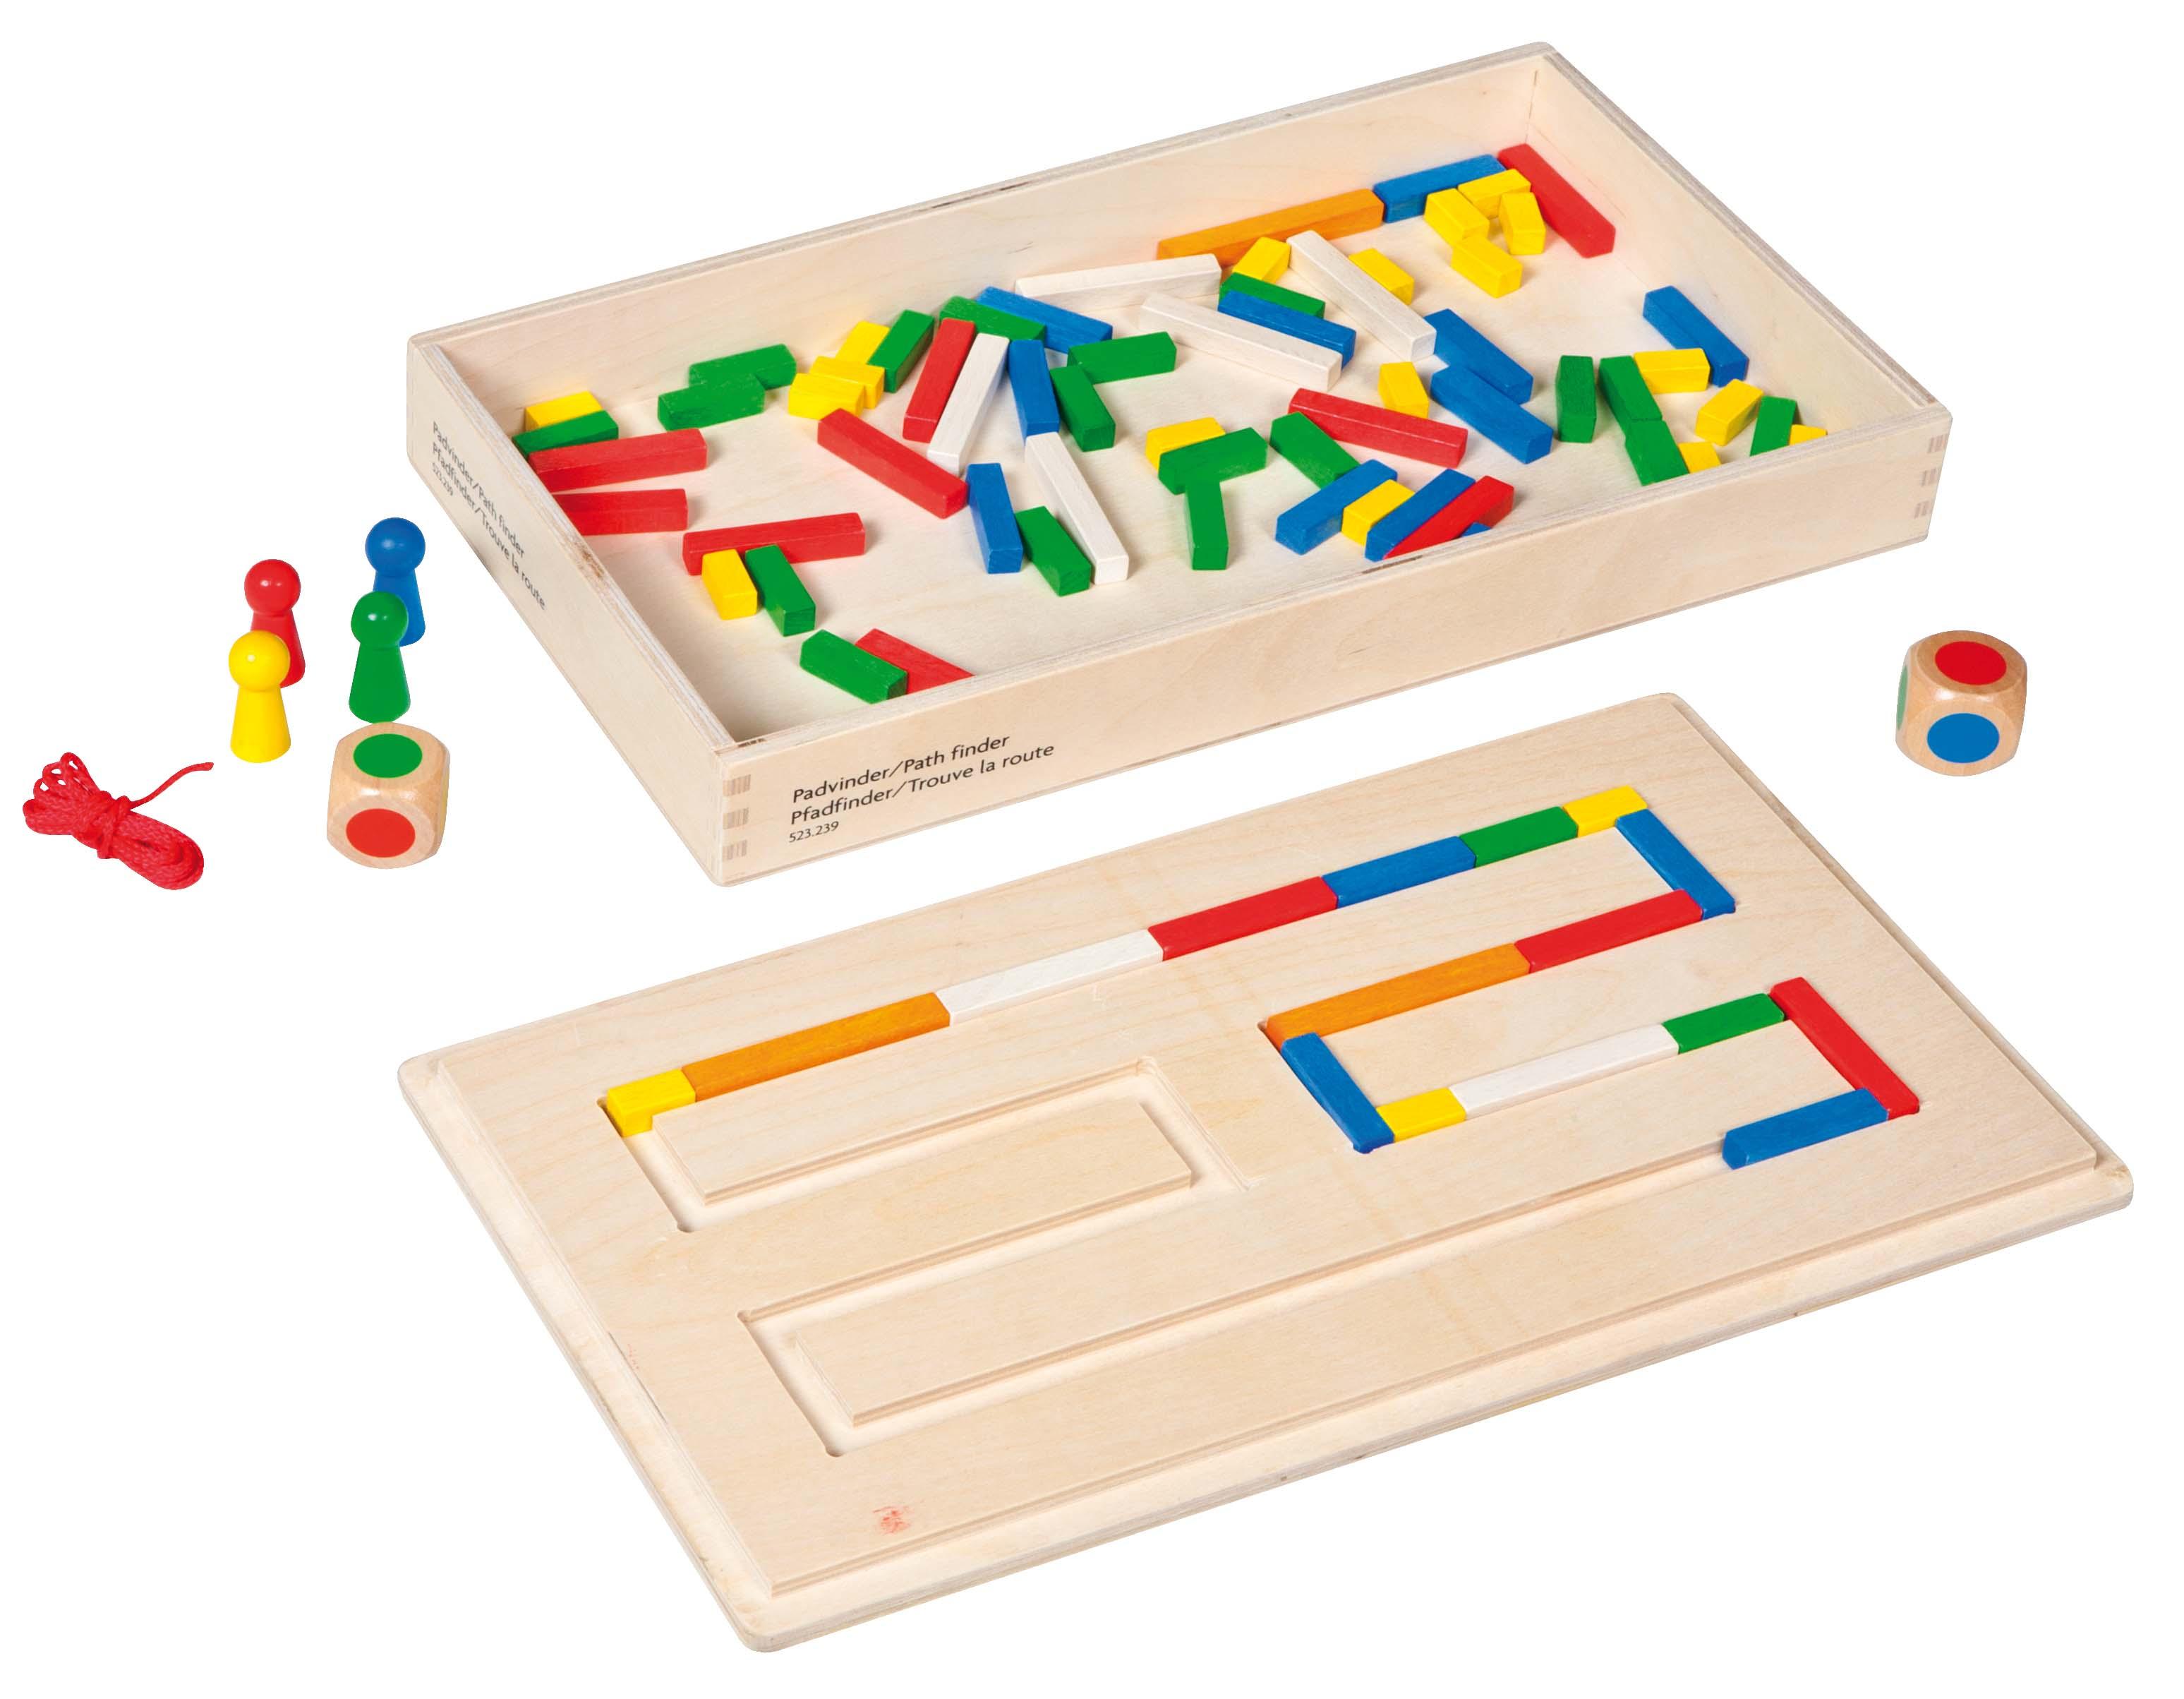 Pathfinder game